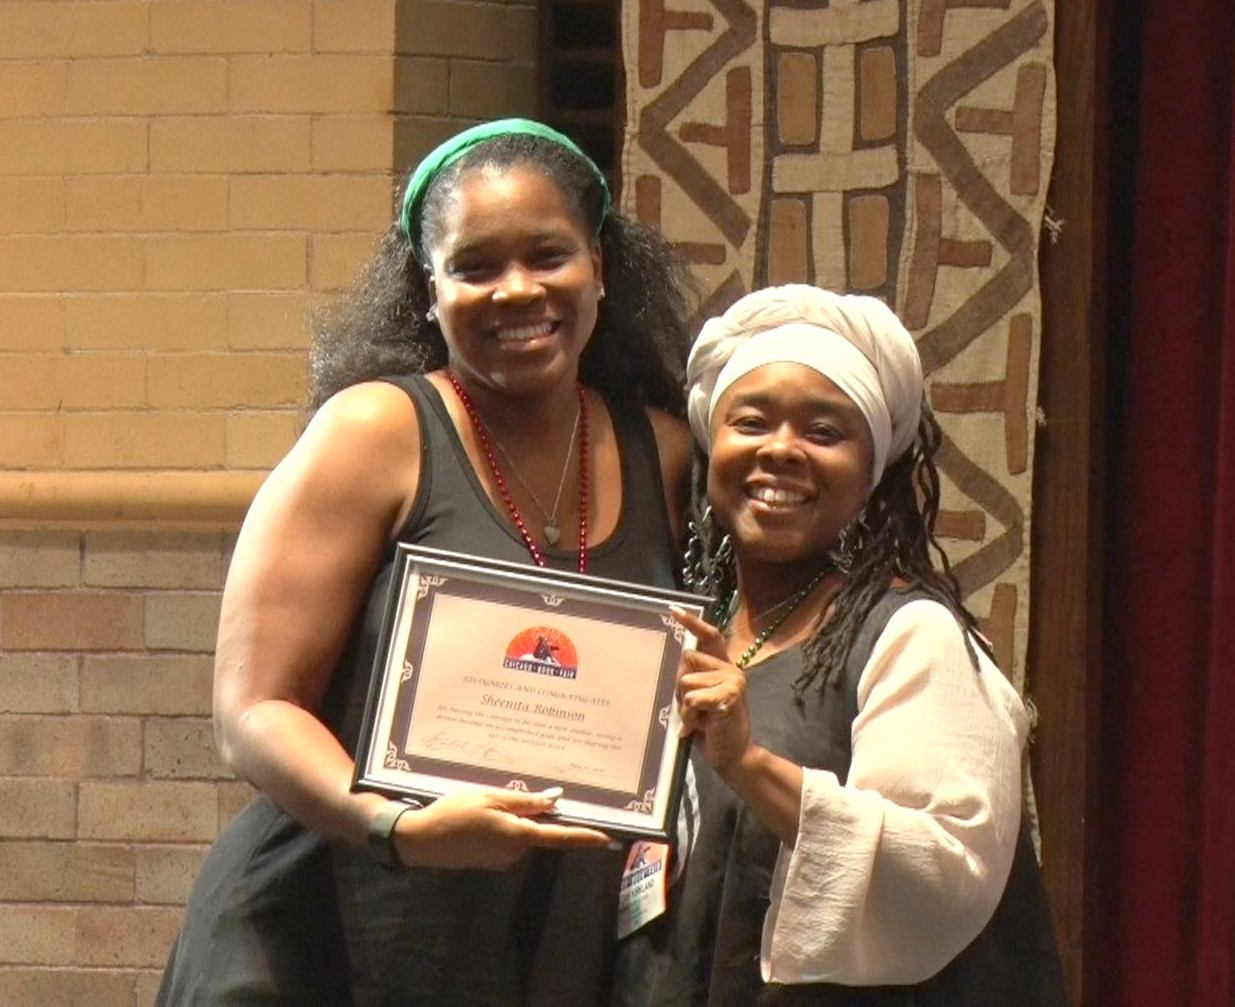 Sheenita New Author Award